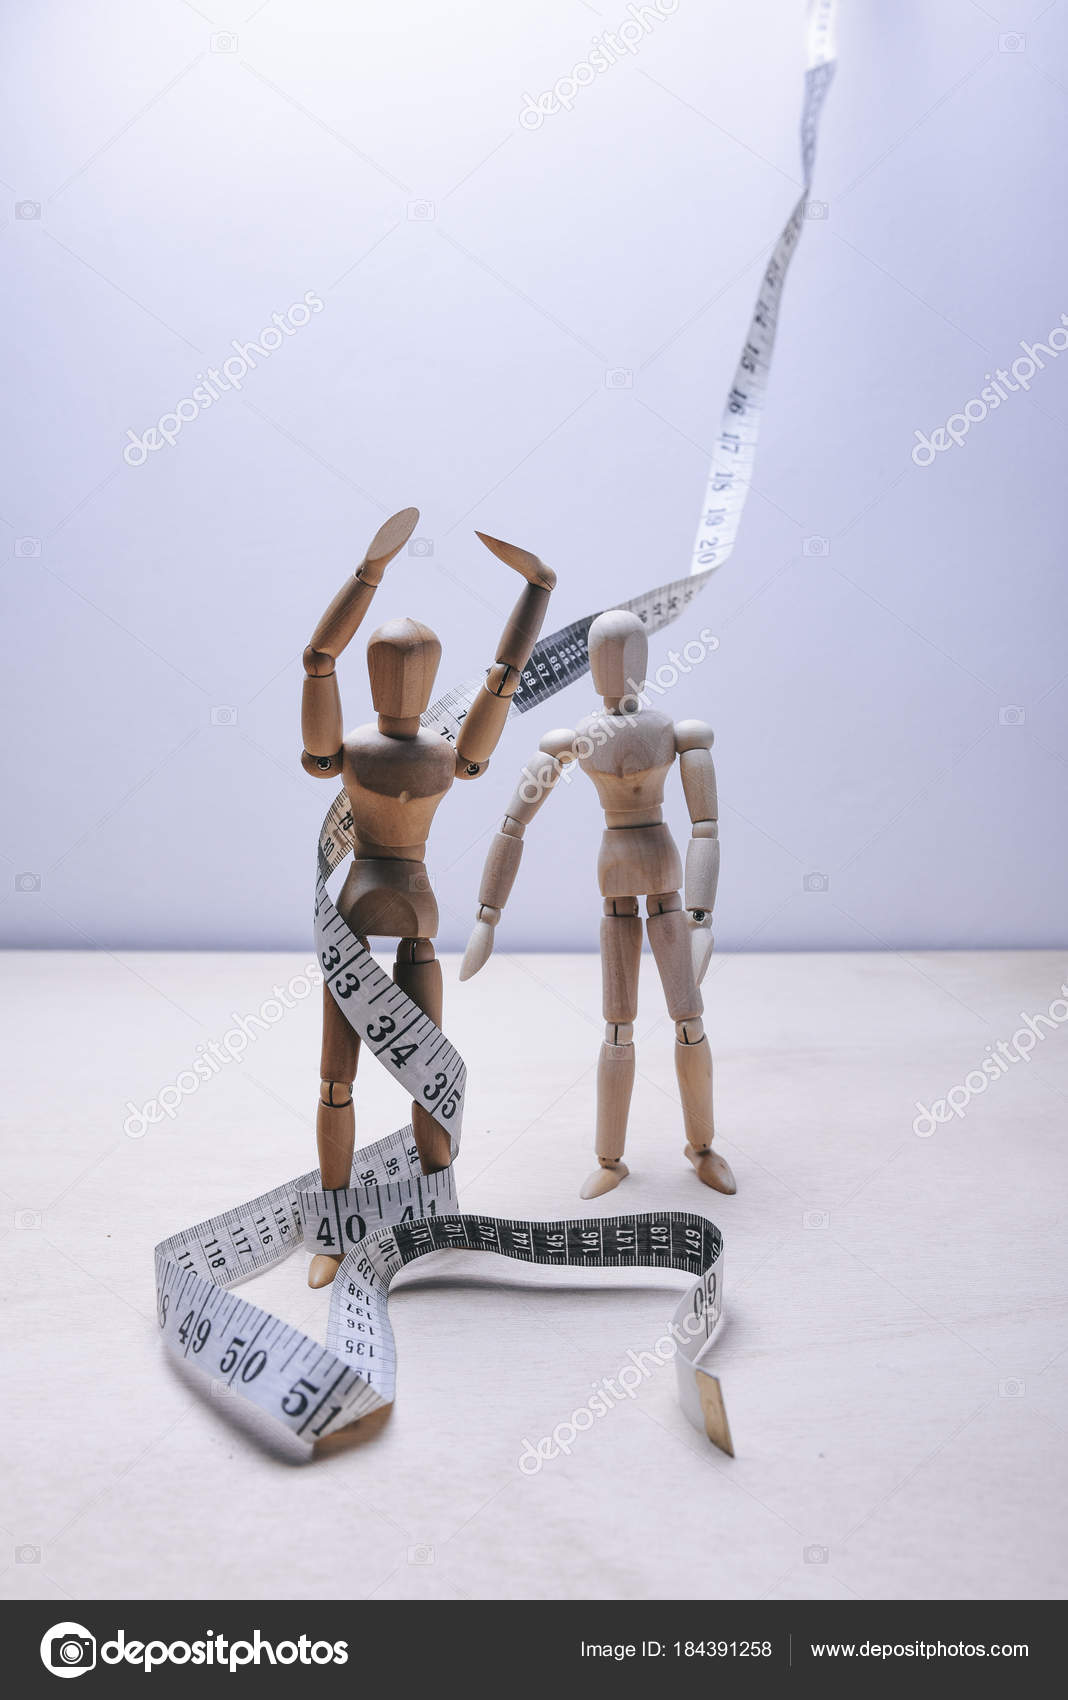 Wooden mannequins tape measure light background stock photo wooden mannequins tape measure light background stock photo aloadofball Images